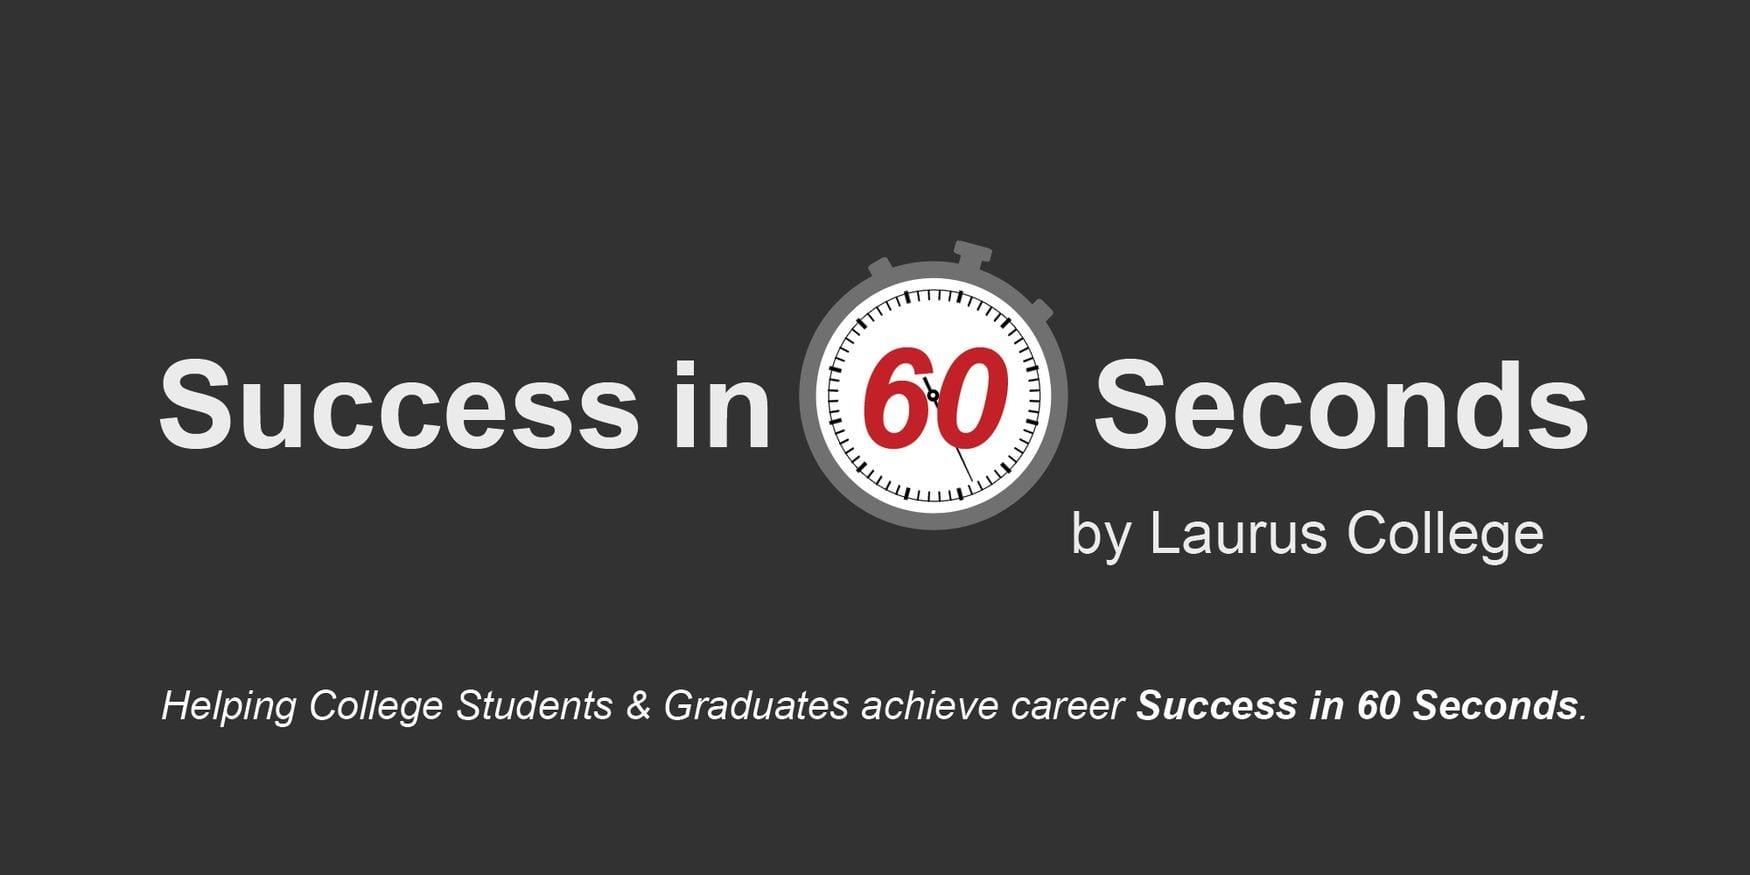 Laurus College Blog – Success in 60 Seconds: LinkedIn